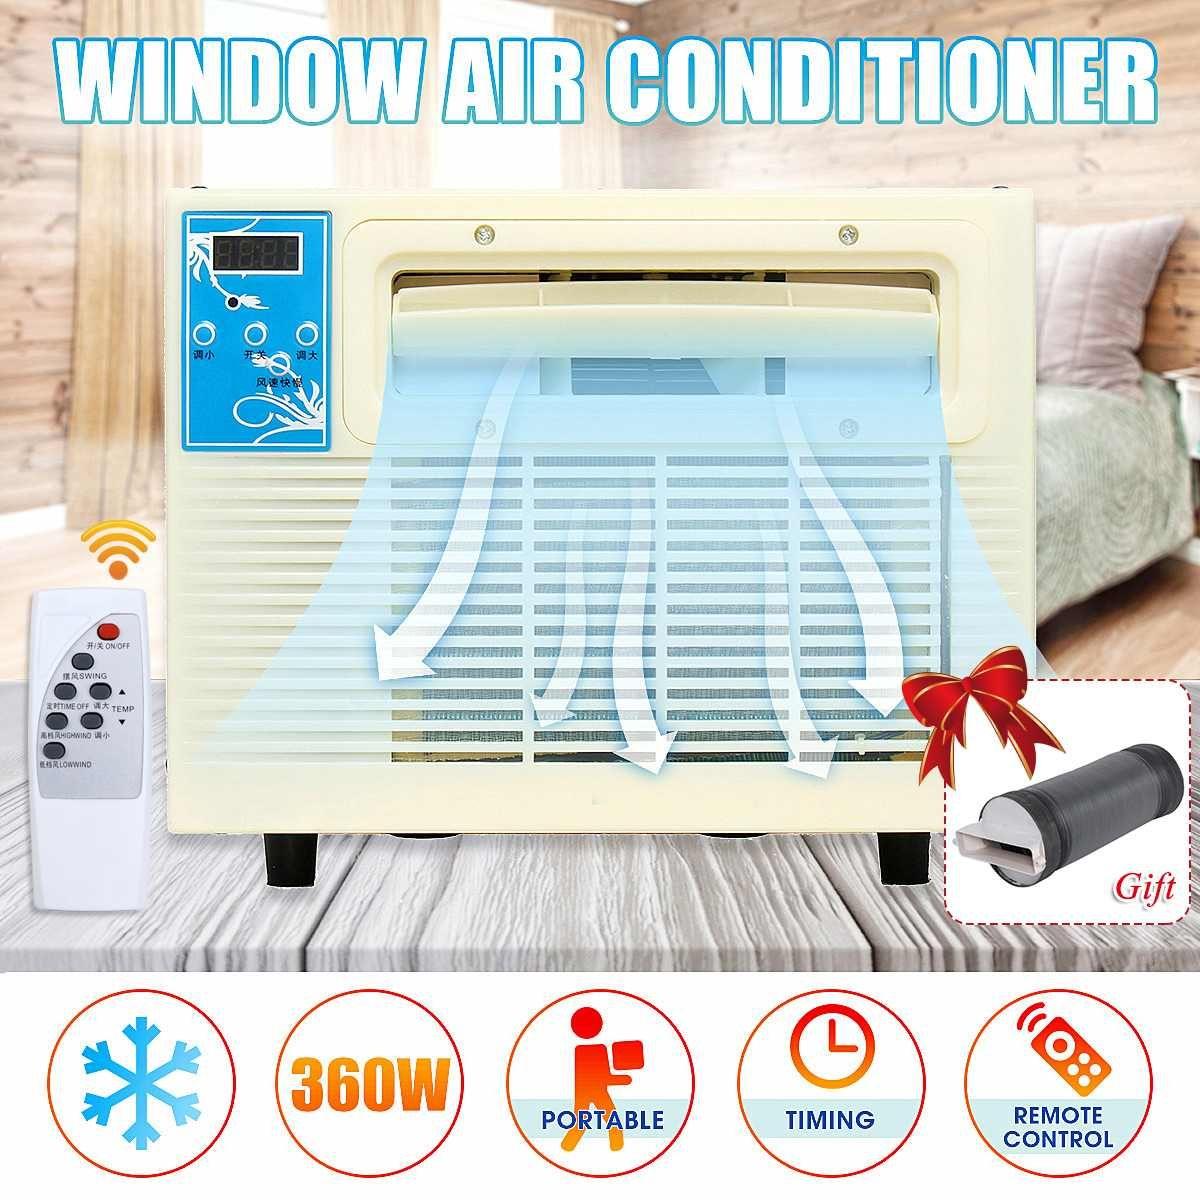 220 V 900 W IPX4 Mini Klimaanlage Desktops Fenster Klimaanlage Haushalts Luftkühler Klimaanlage Mit Fernbedienung